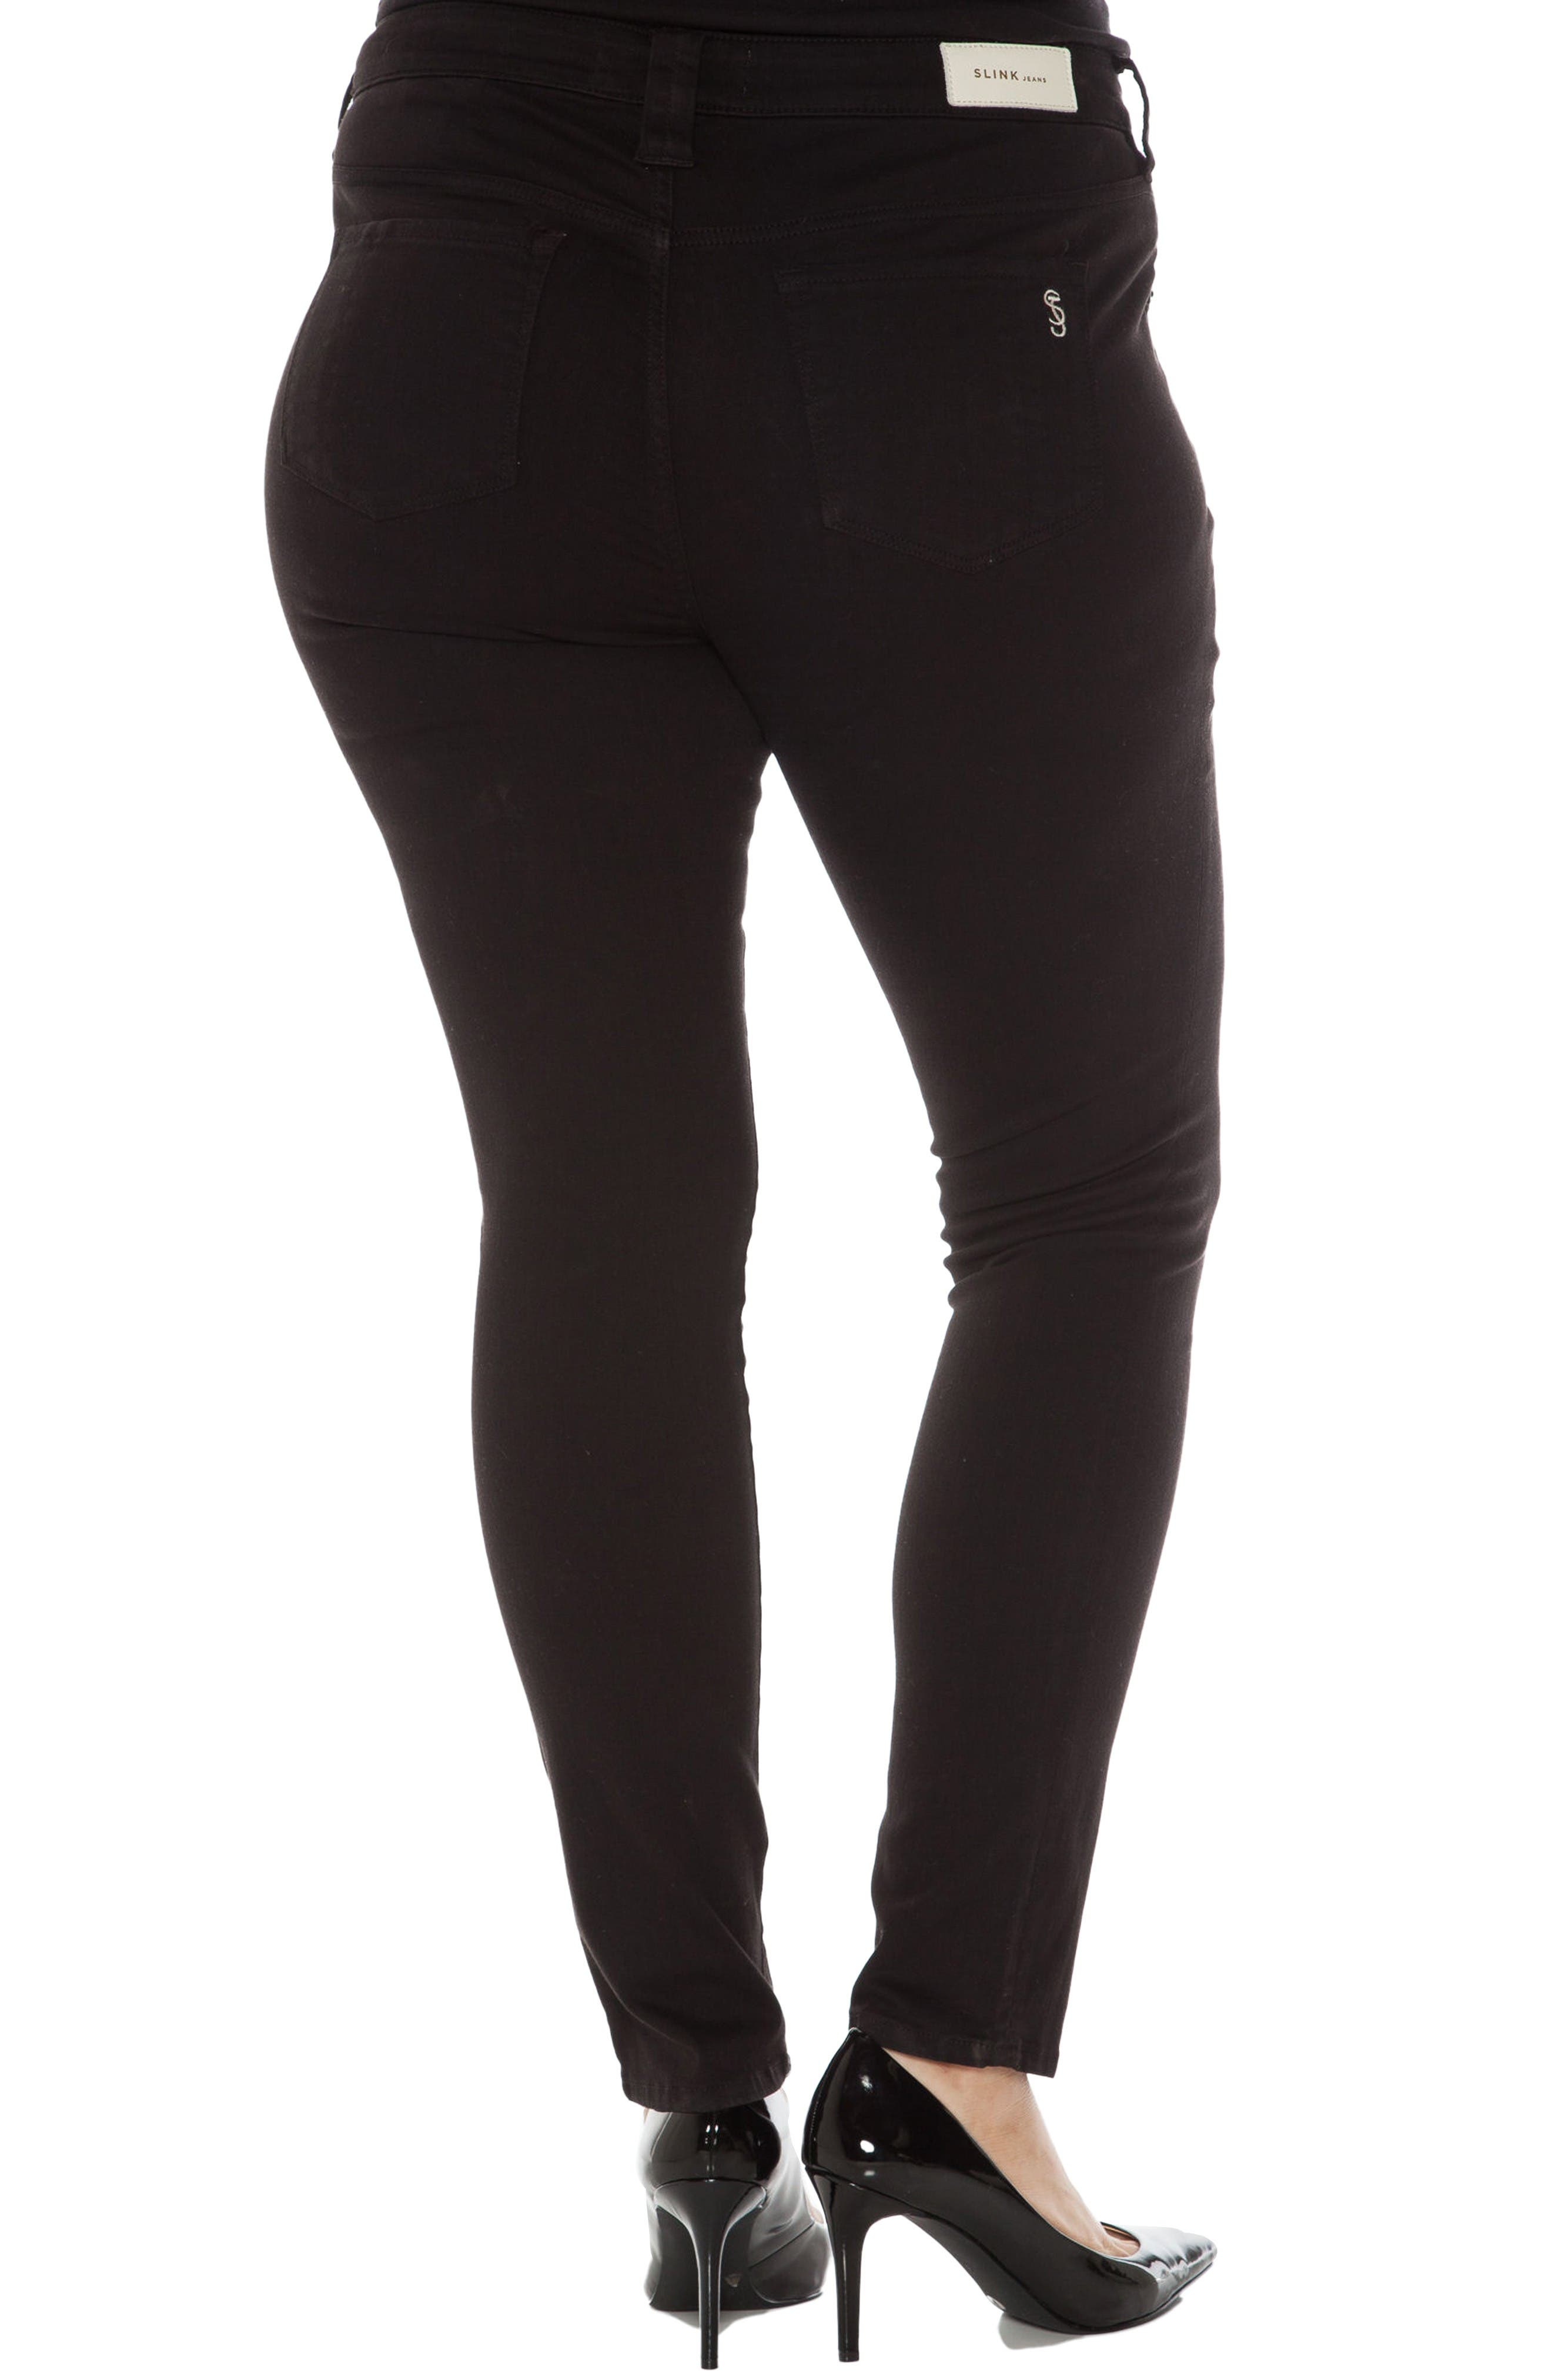 Alternate Image 2  - SLINK Jeans 'The Skinny' Stretch Denim Jeans (Danielle) (Plus Size)